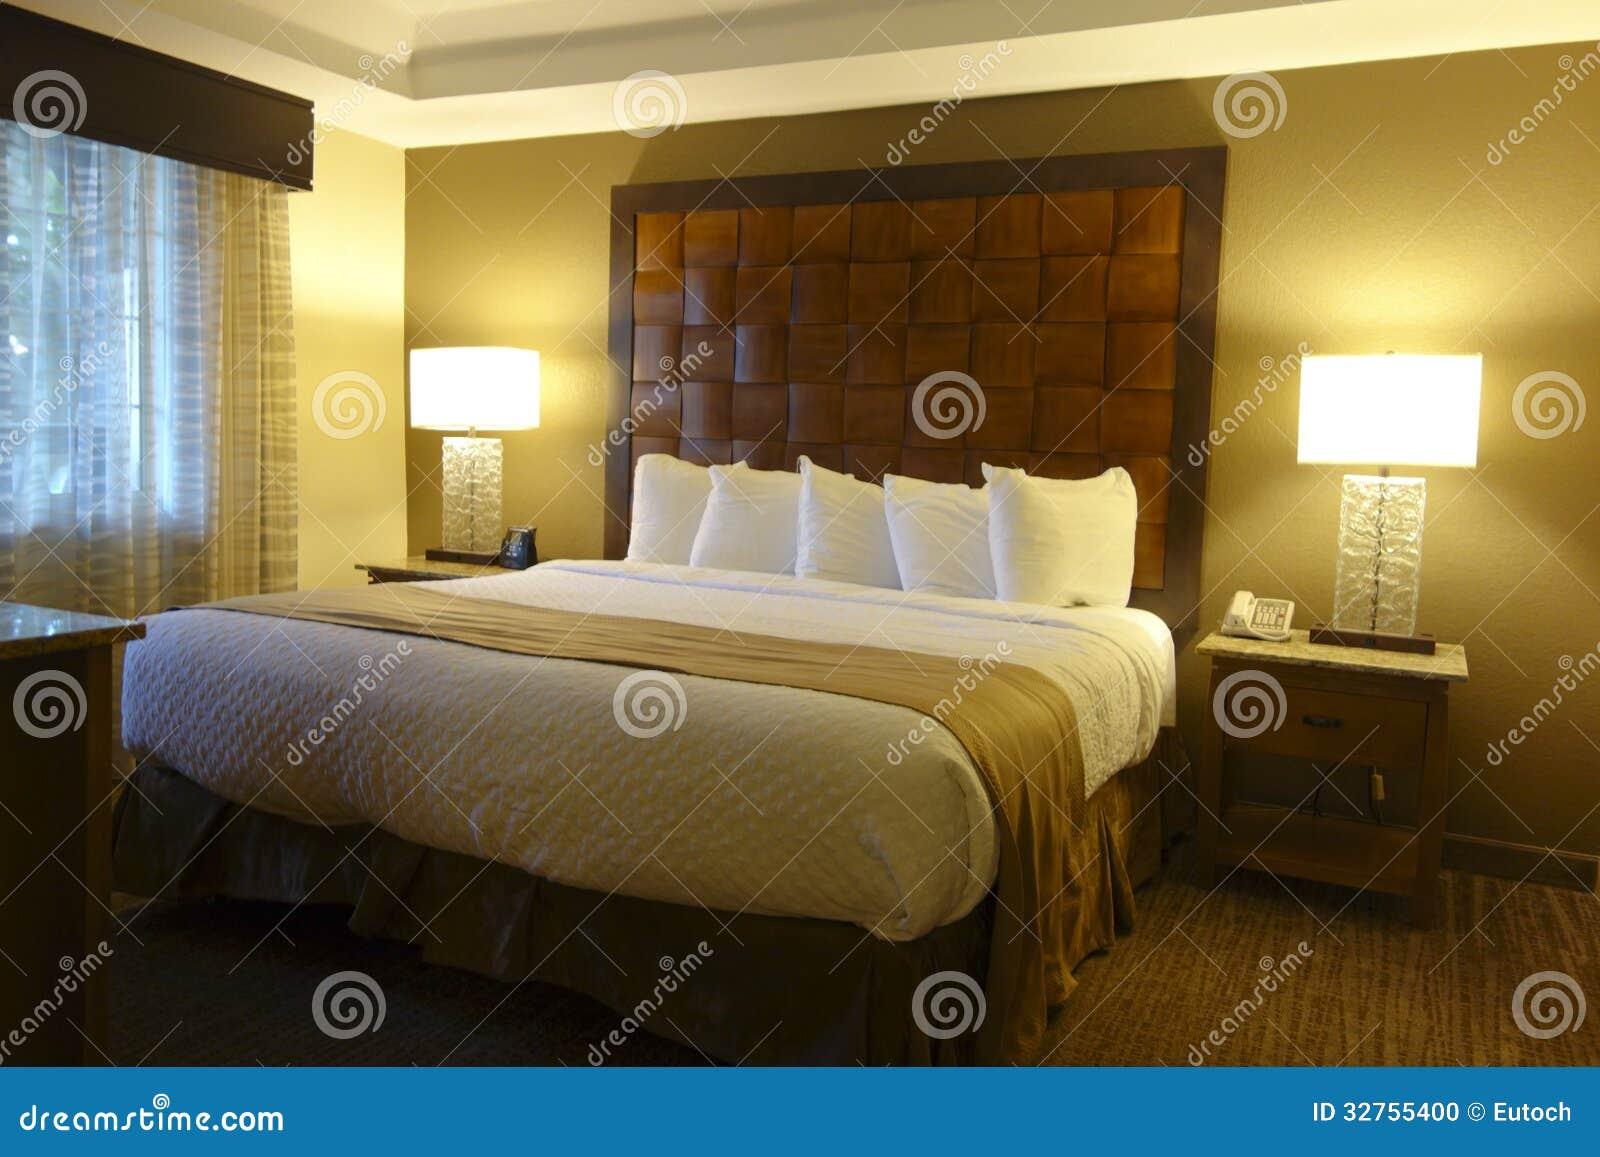 Luxury Hotel Bedroom Stock Photo Image Of Pattern Inside 32755400